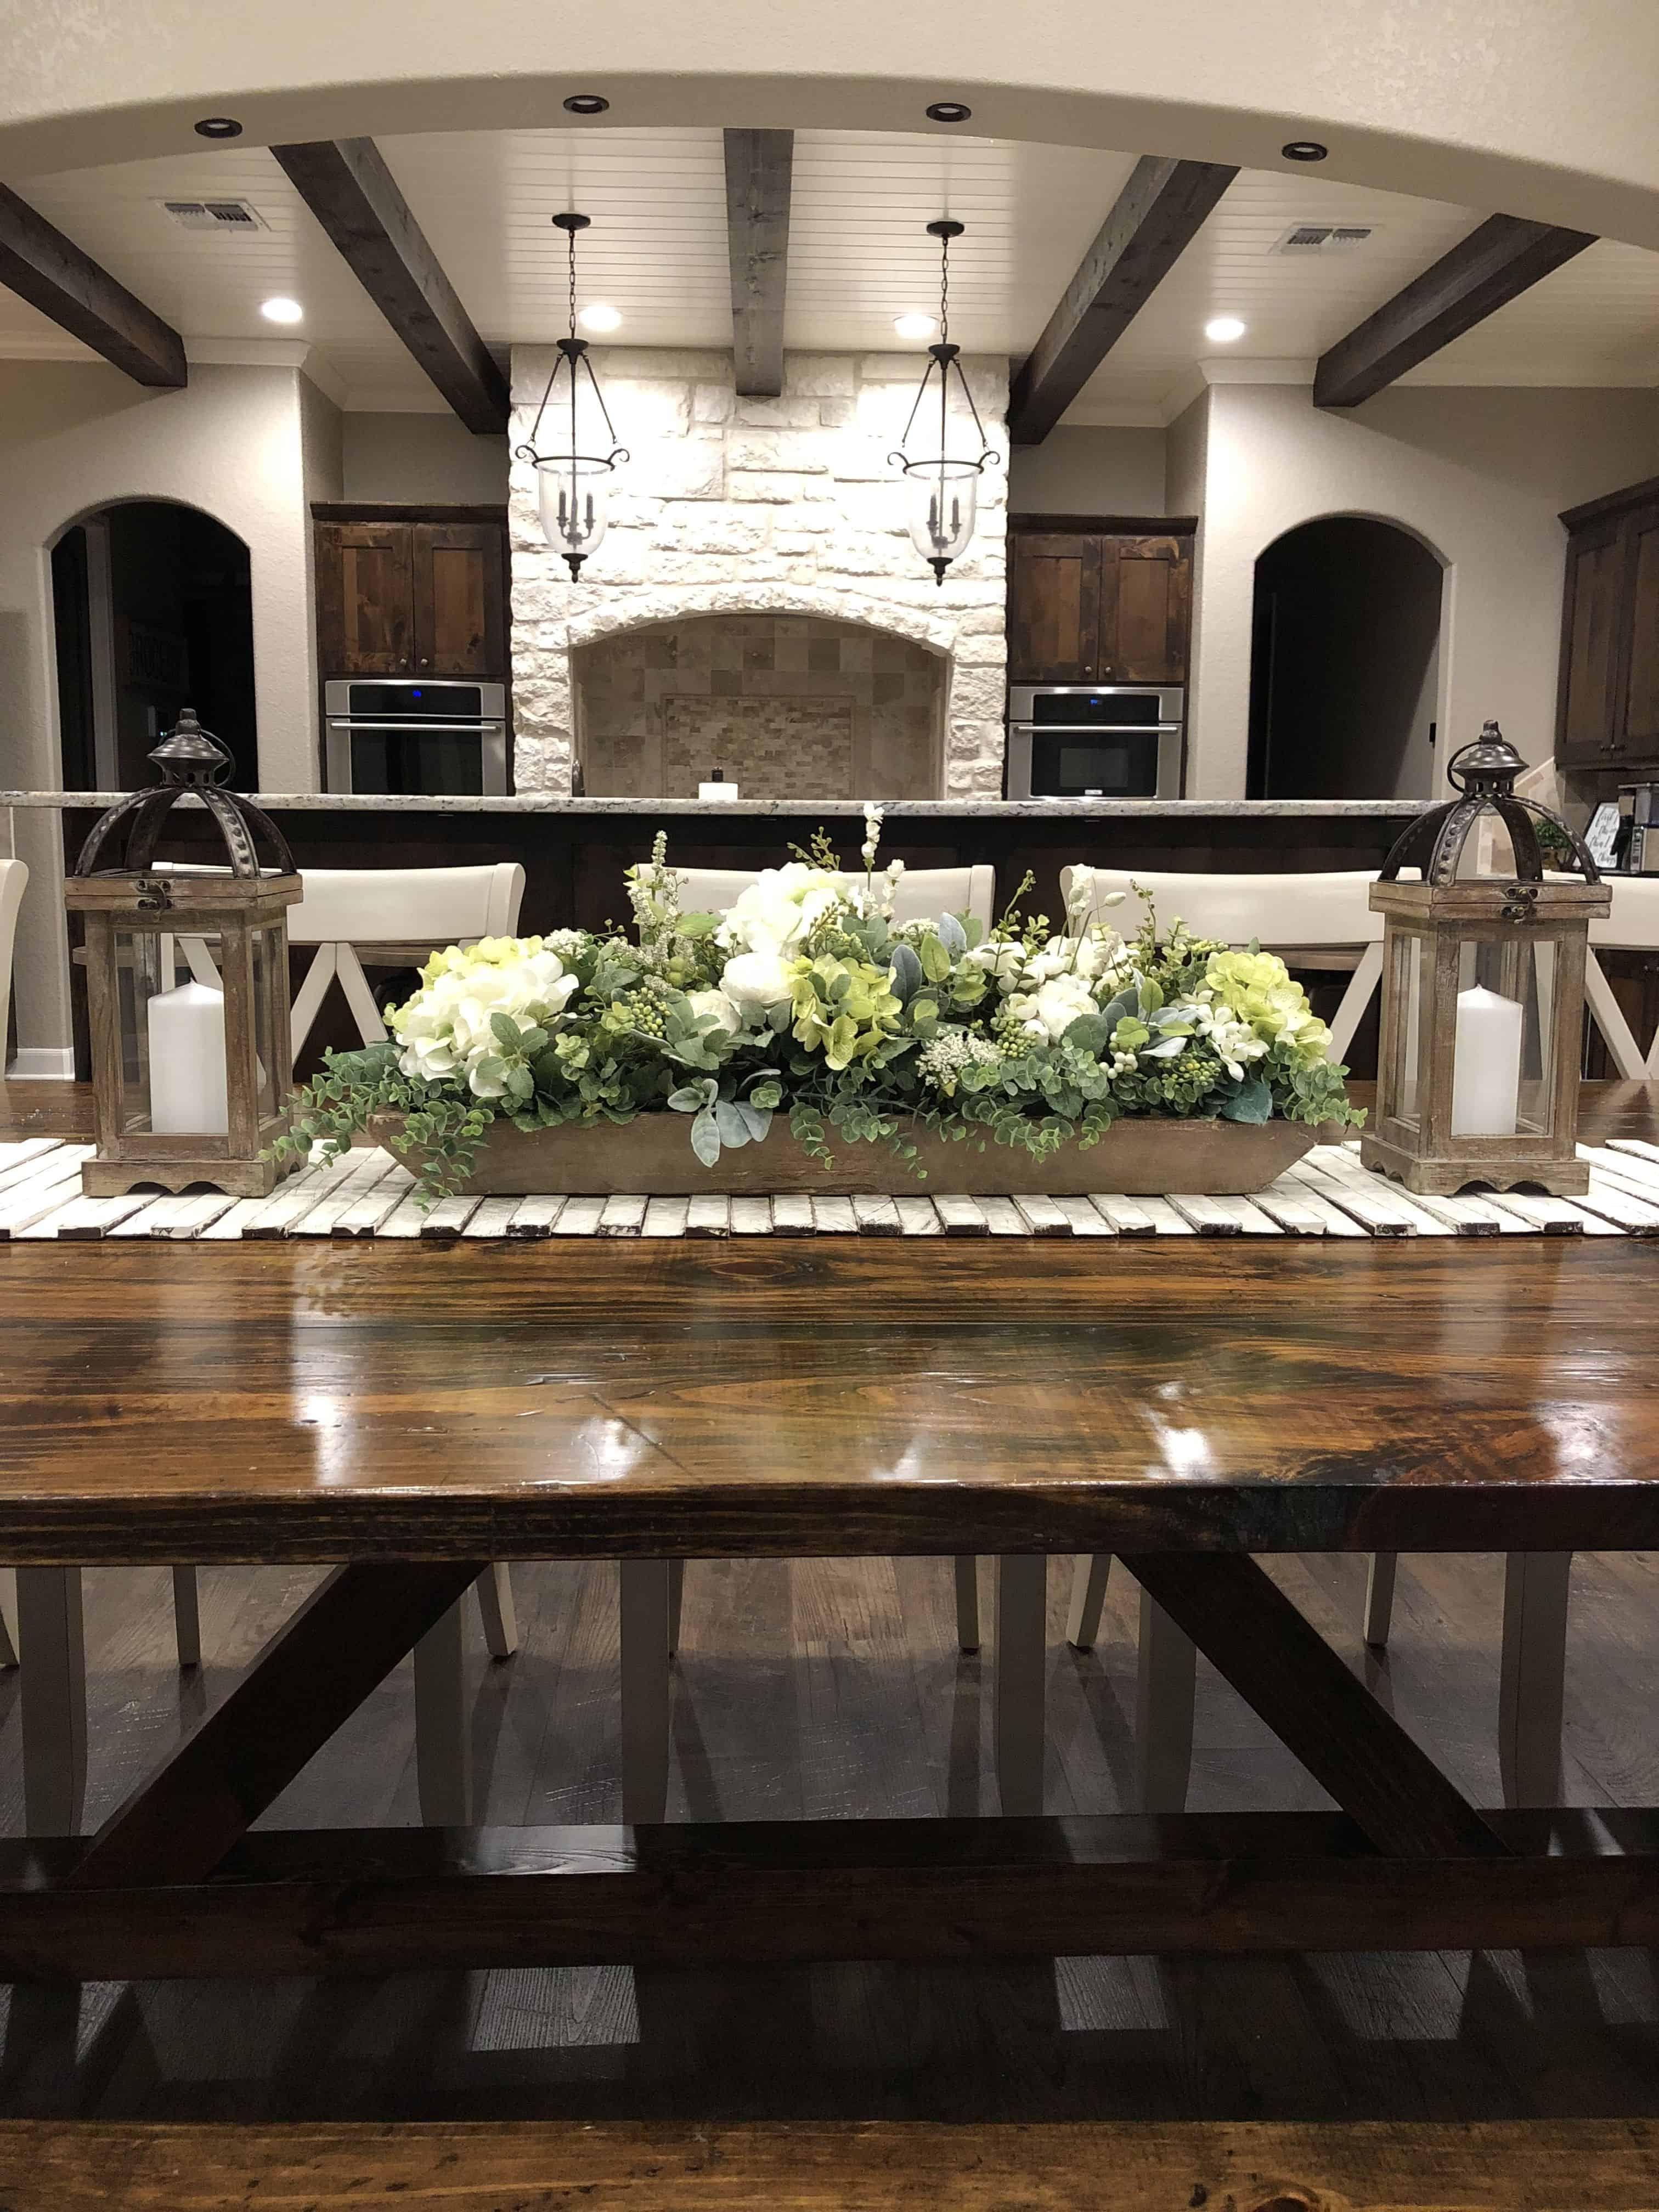 Stunning Fall Dining Room Centerpiece Ideas Dining Room Centerpiece Fall Dining Room Dining Centerpiece